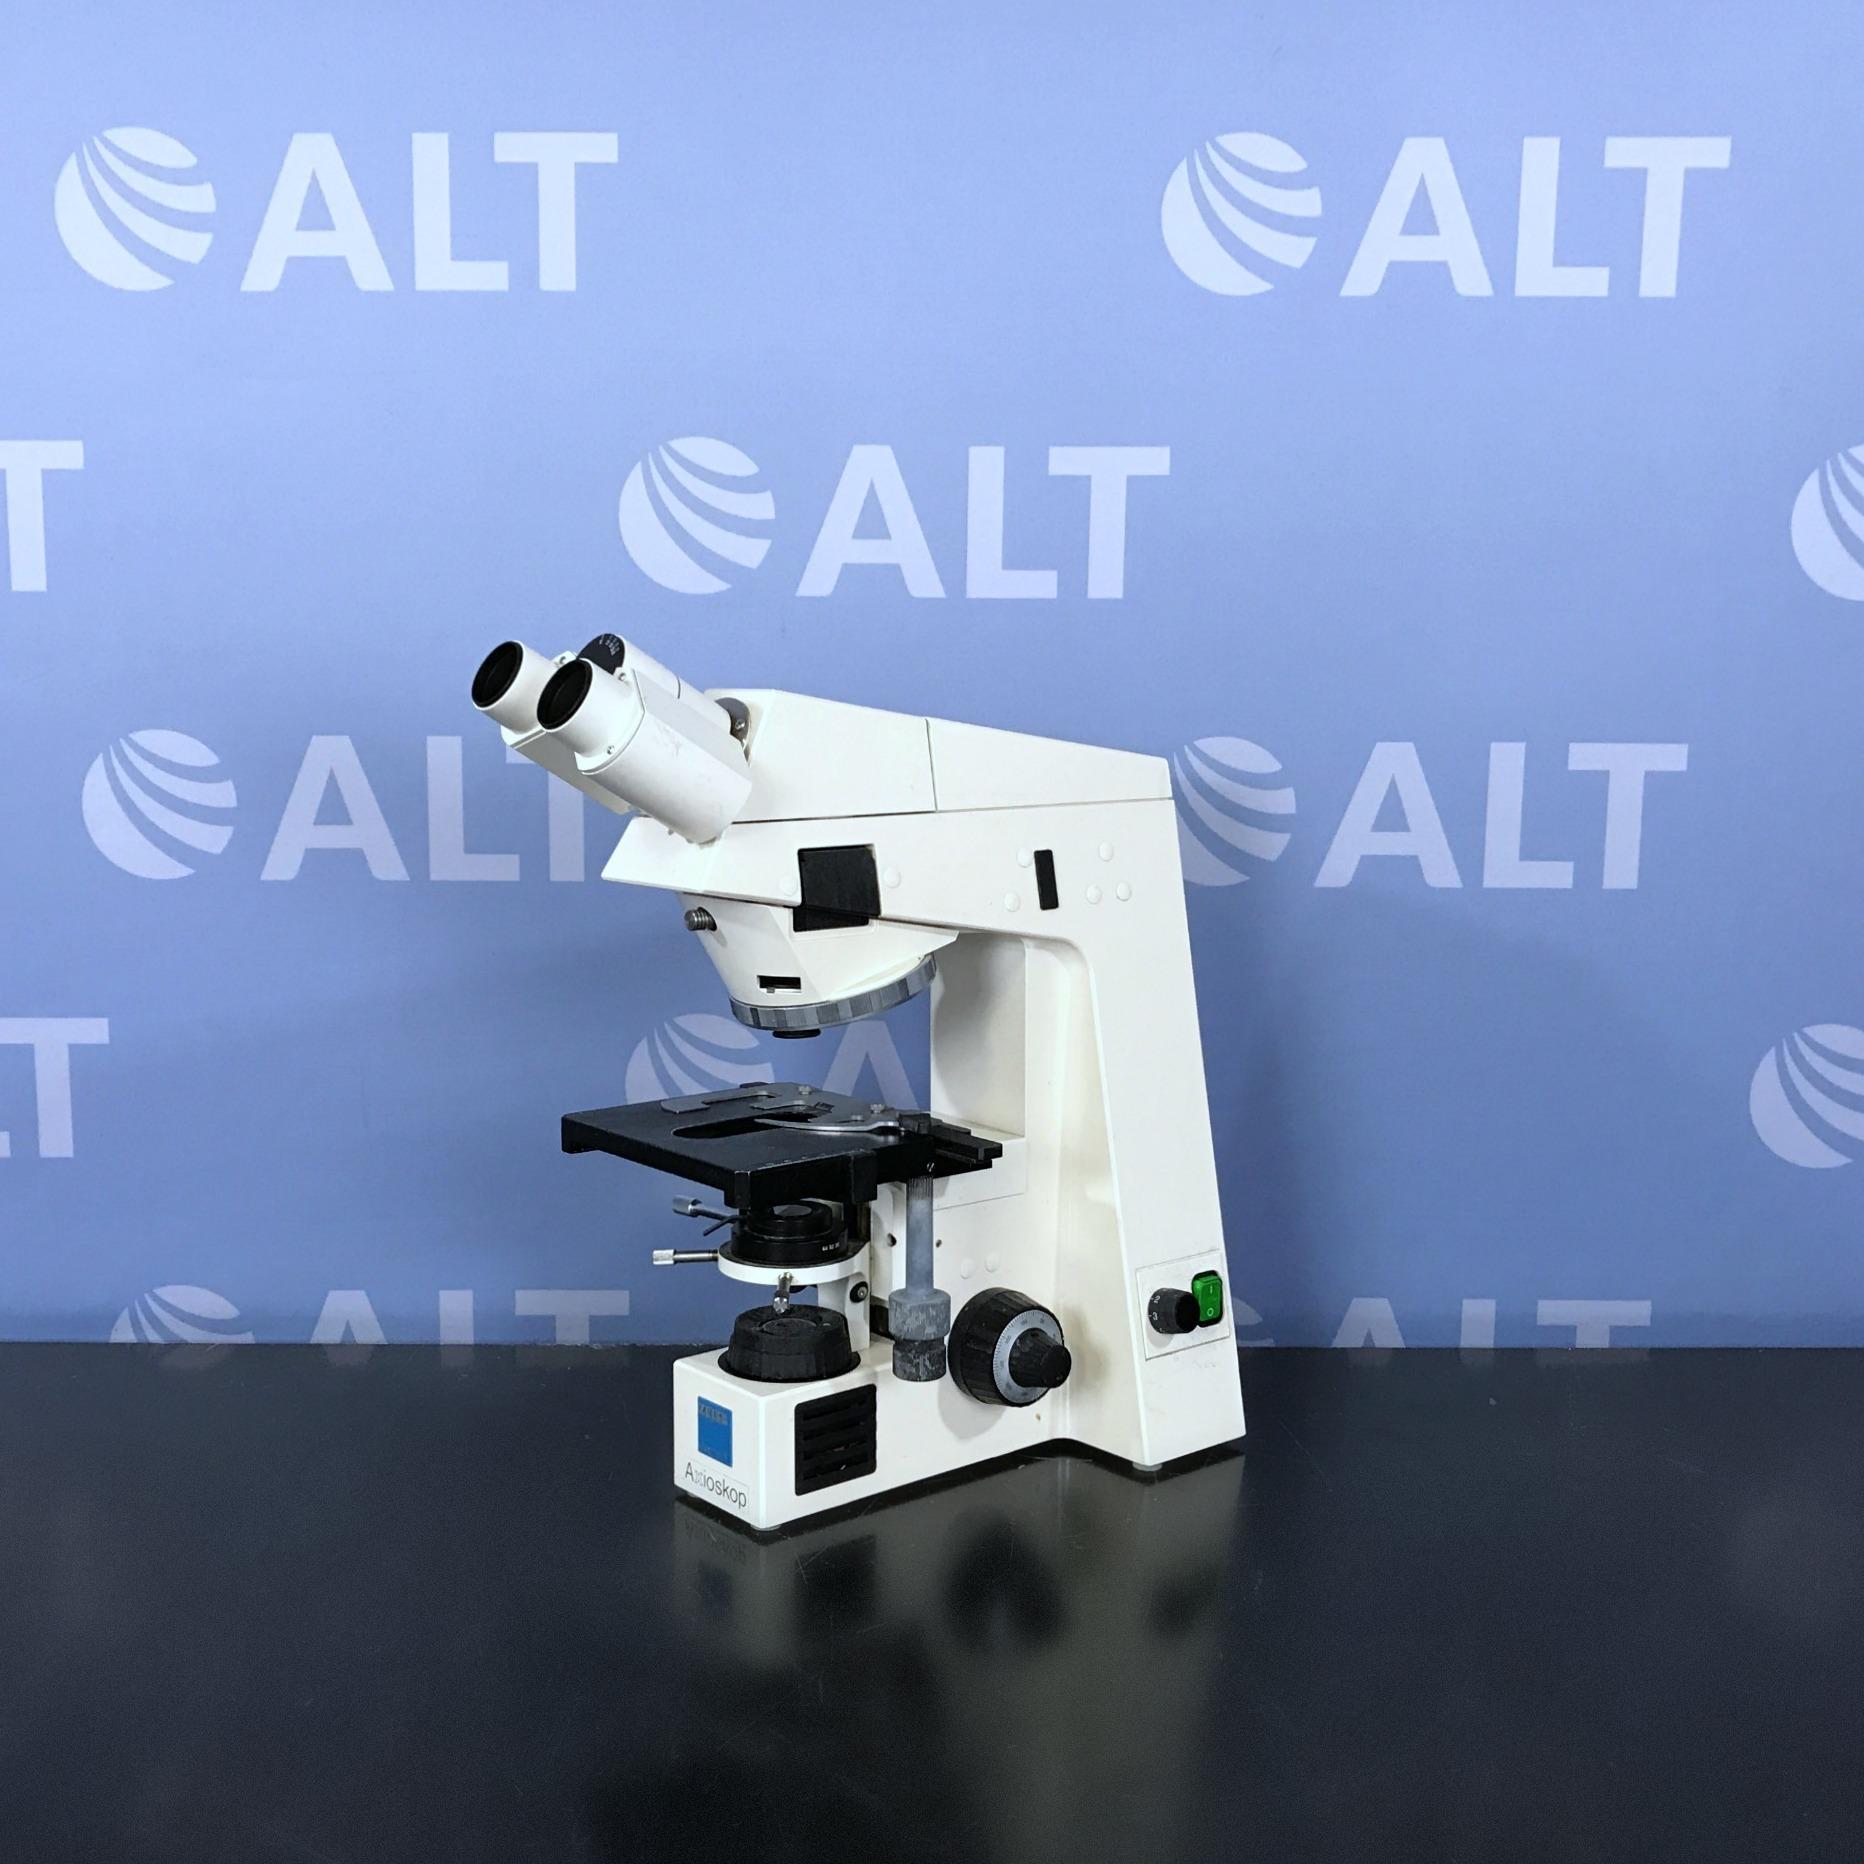 Carl Zeiss Axioskop EL-Einsatz Microscope  Model 45 14 87 Image